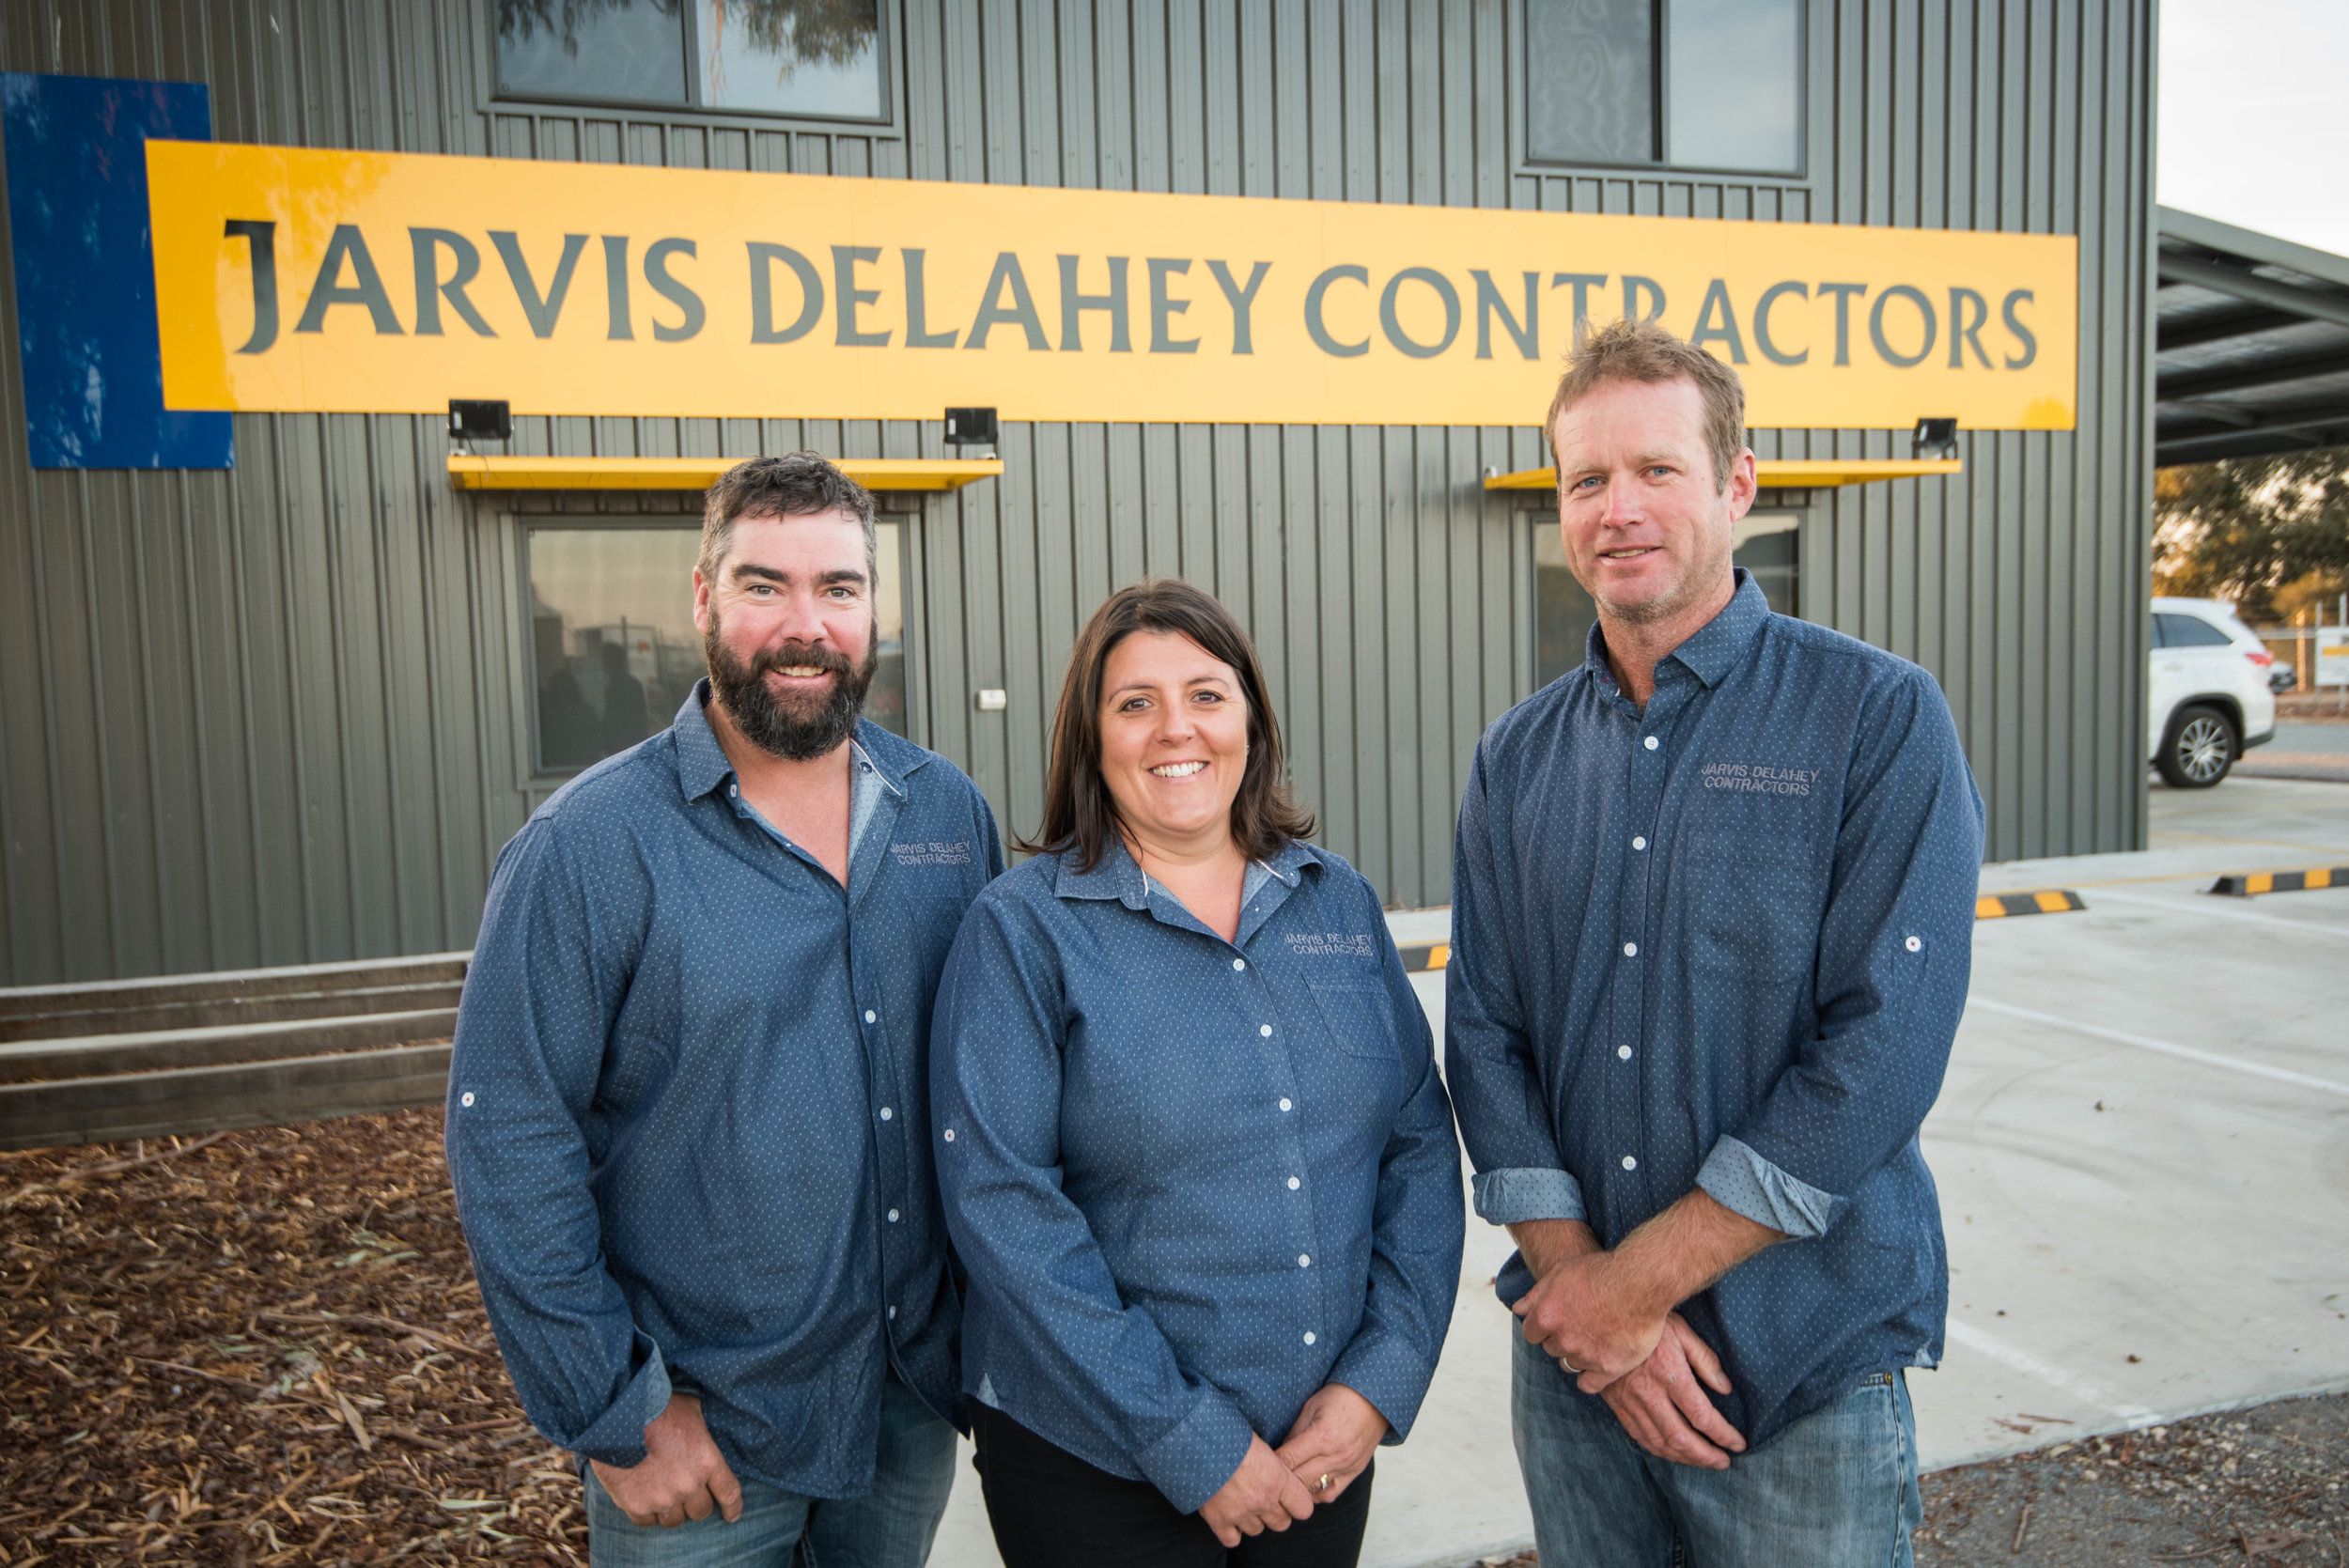 From left: Nathan Delahey Managing Director, Leisa Delahey Office Manager, Richard Jarvis Managing Director